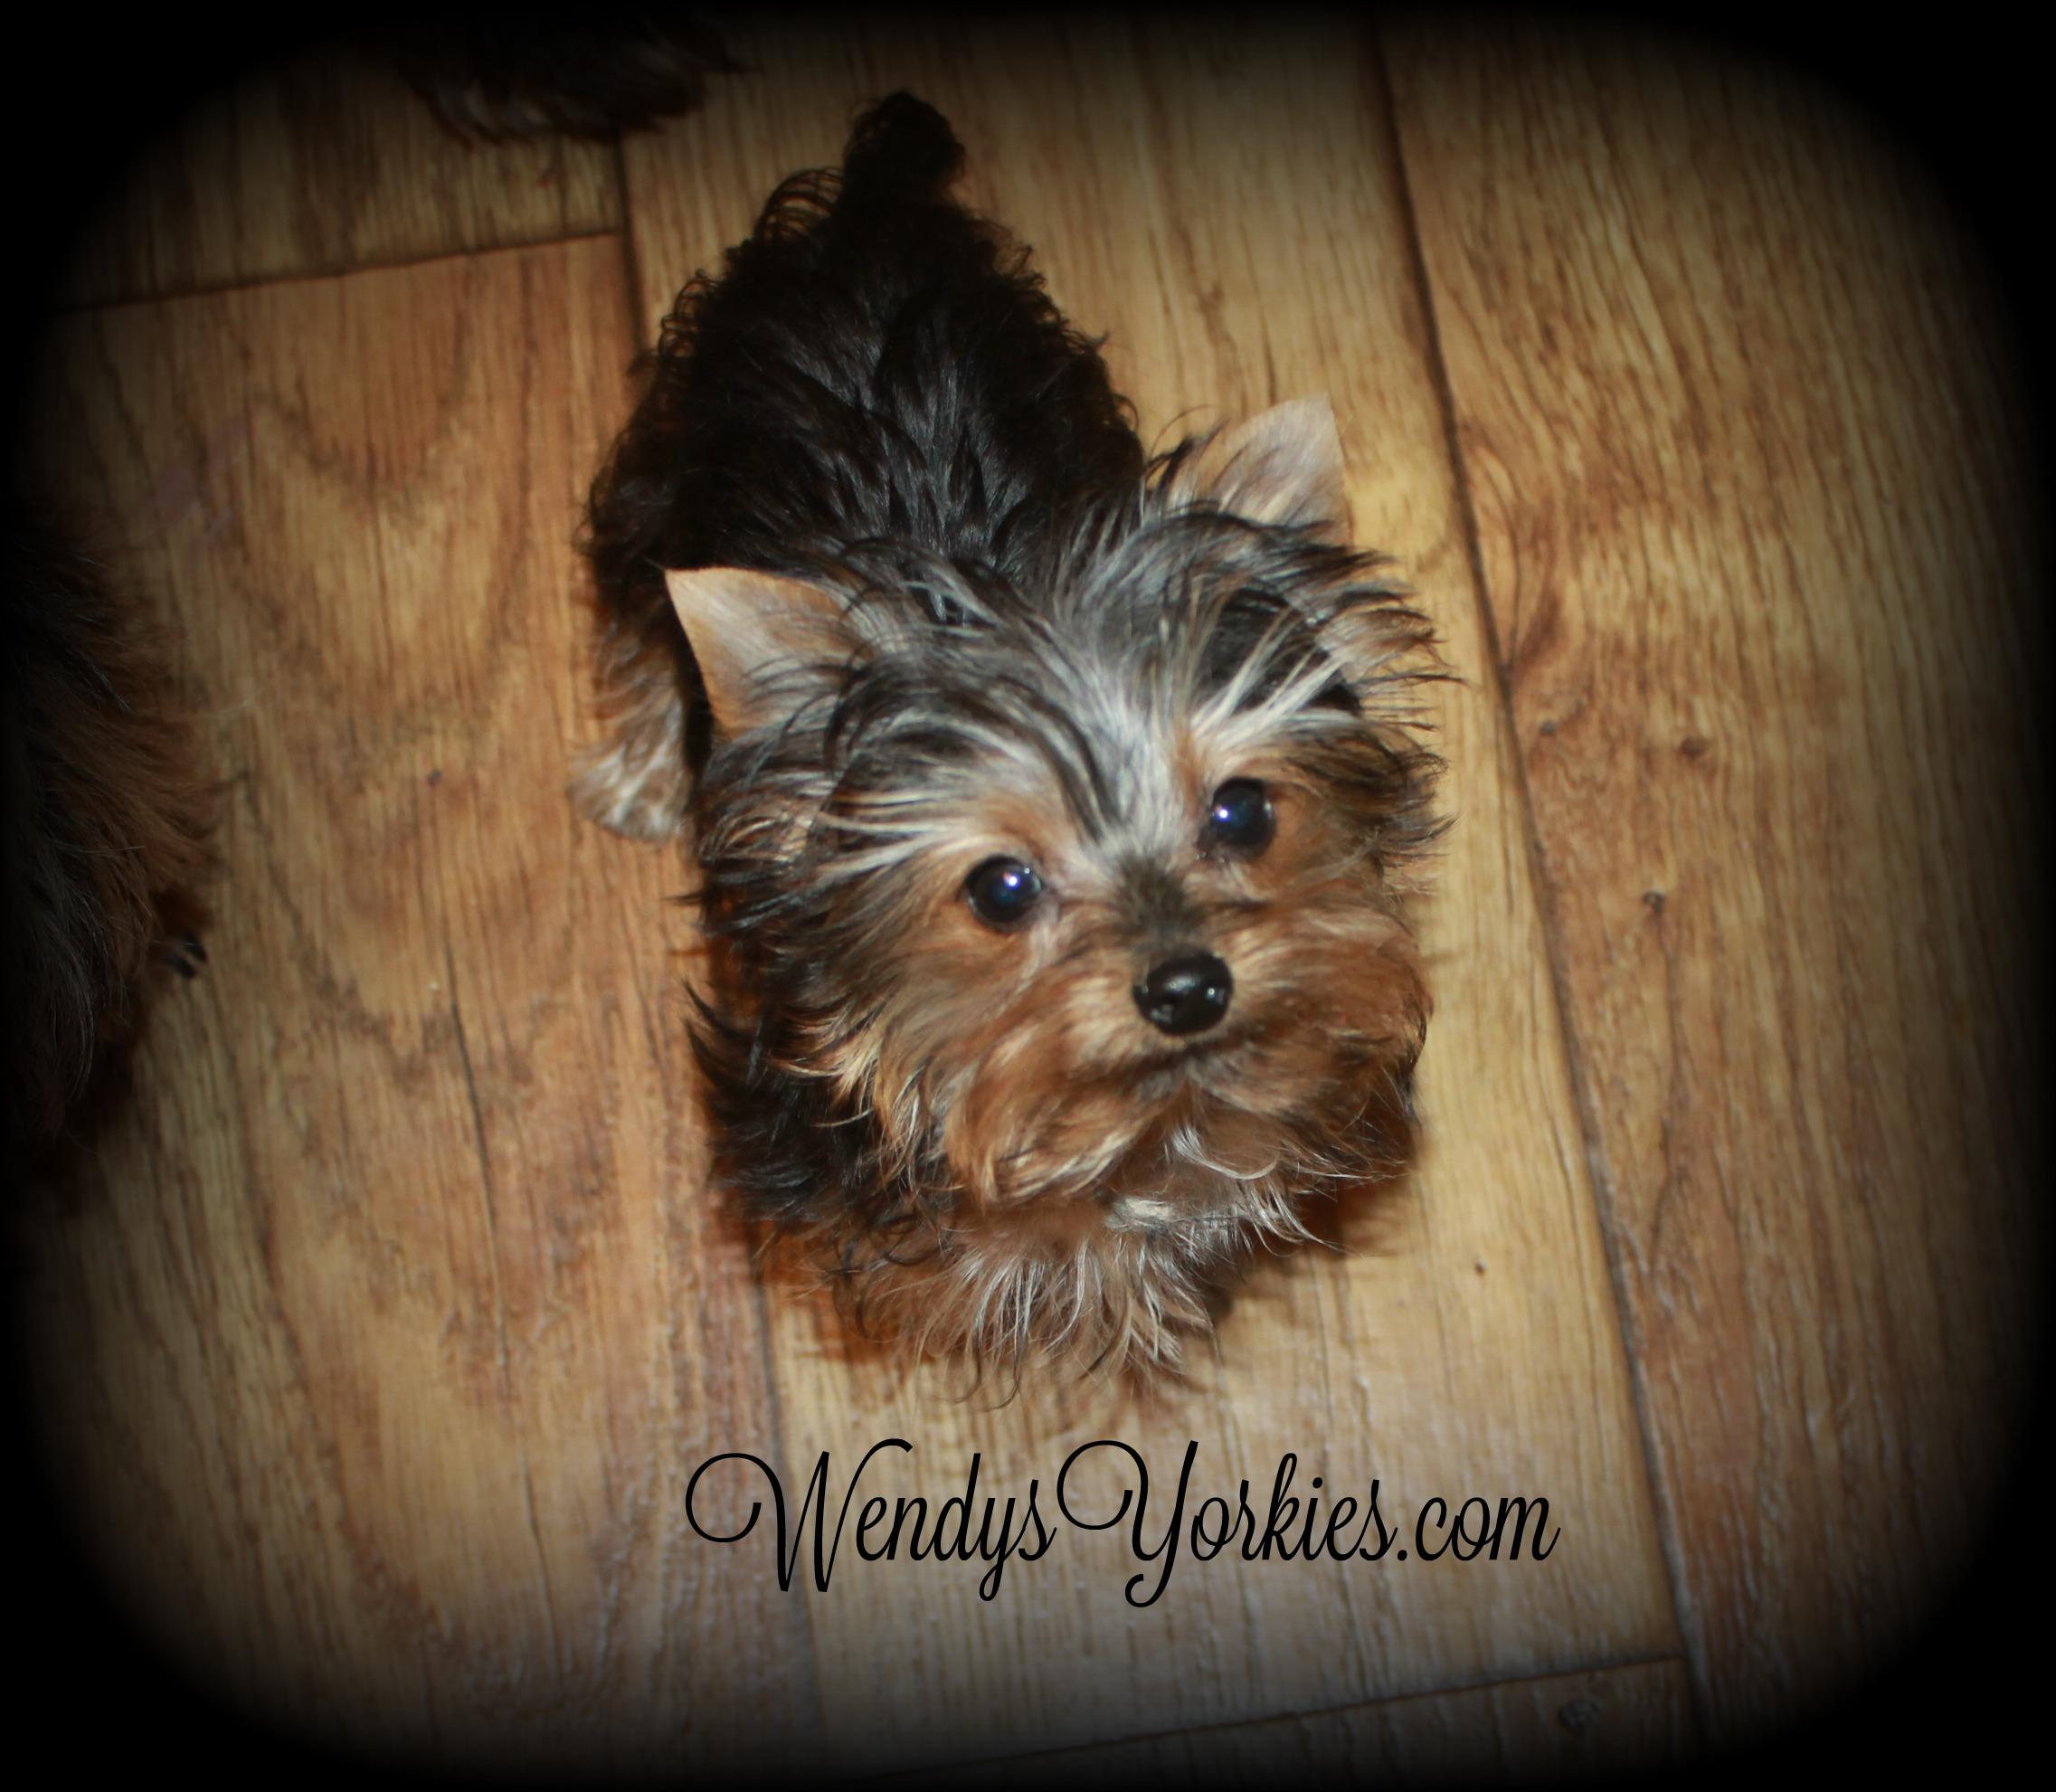 Tiny Yorkies puppies for sale, WendysYorkies.com, Tiny